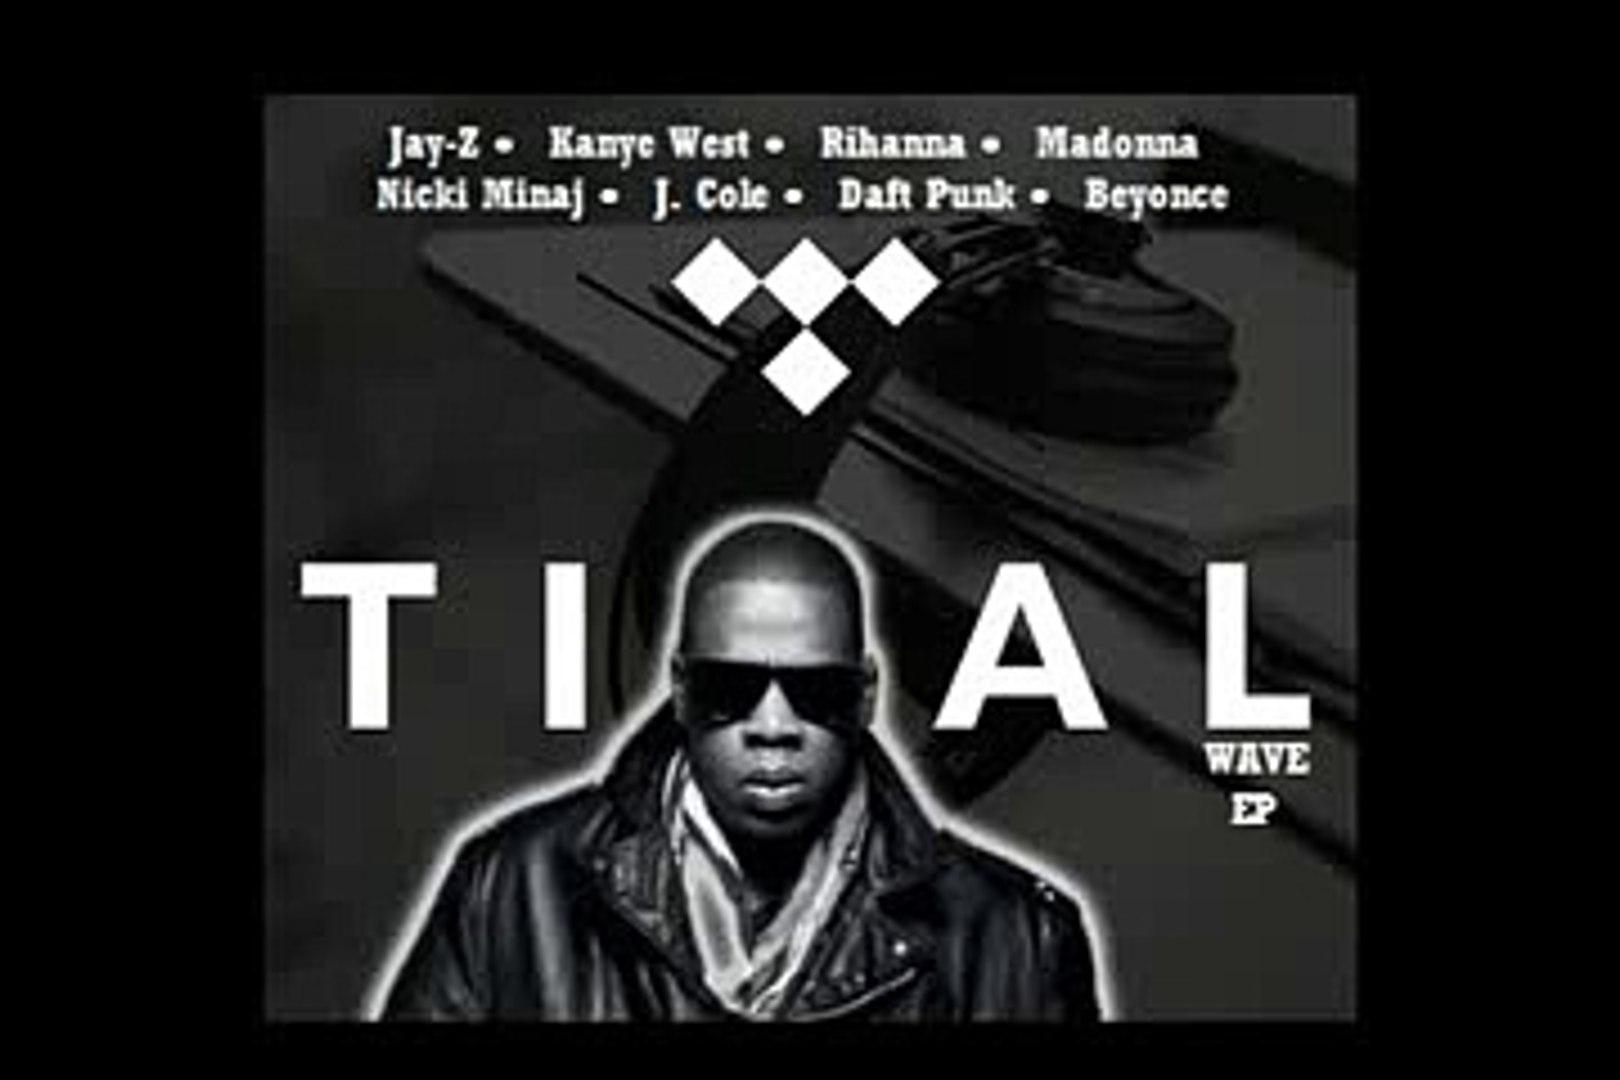 Jay Z - TIDAL (Remix) Feat. Daft Punk [TIDAL Wave EP]